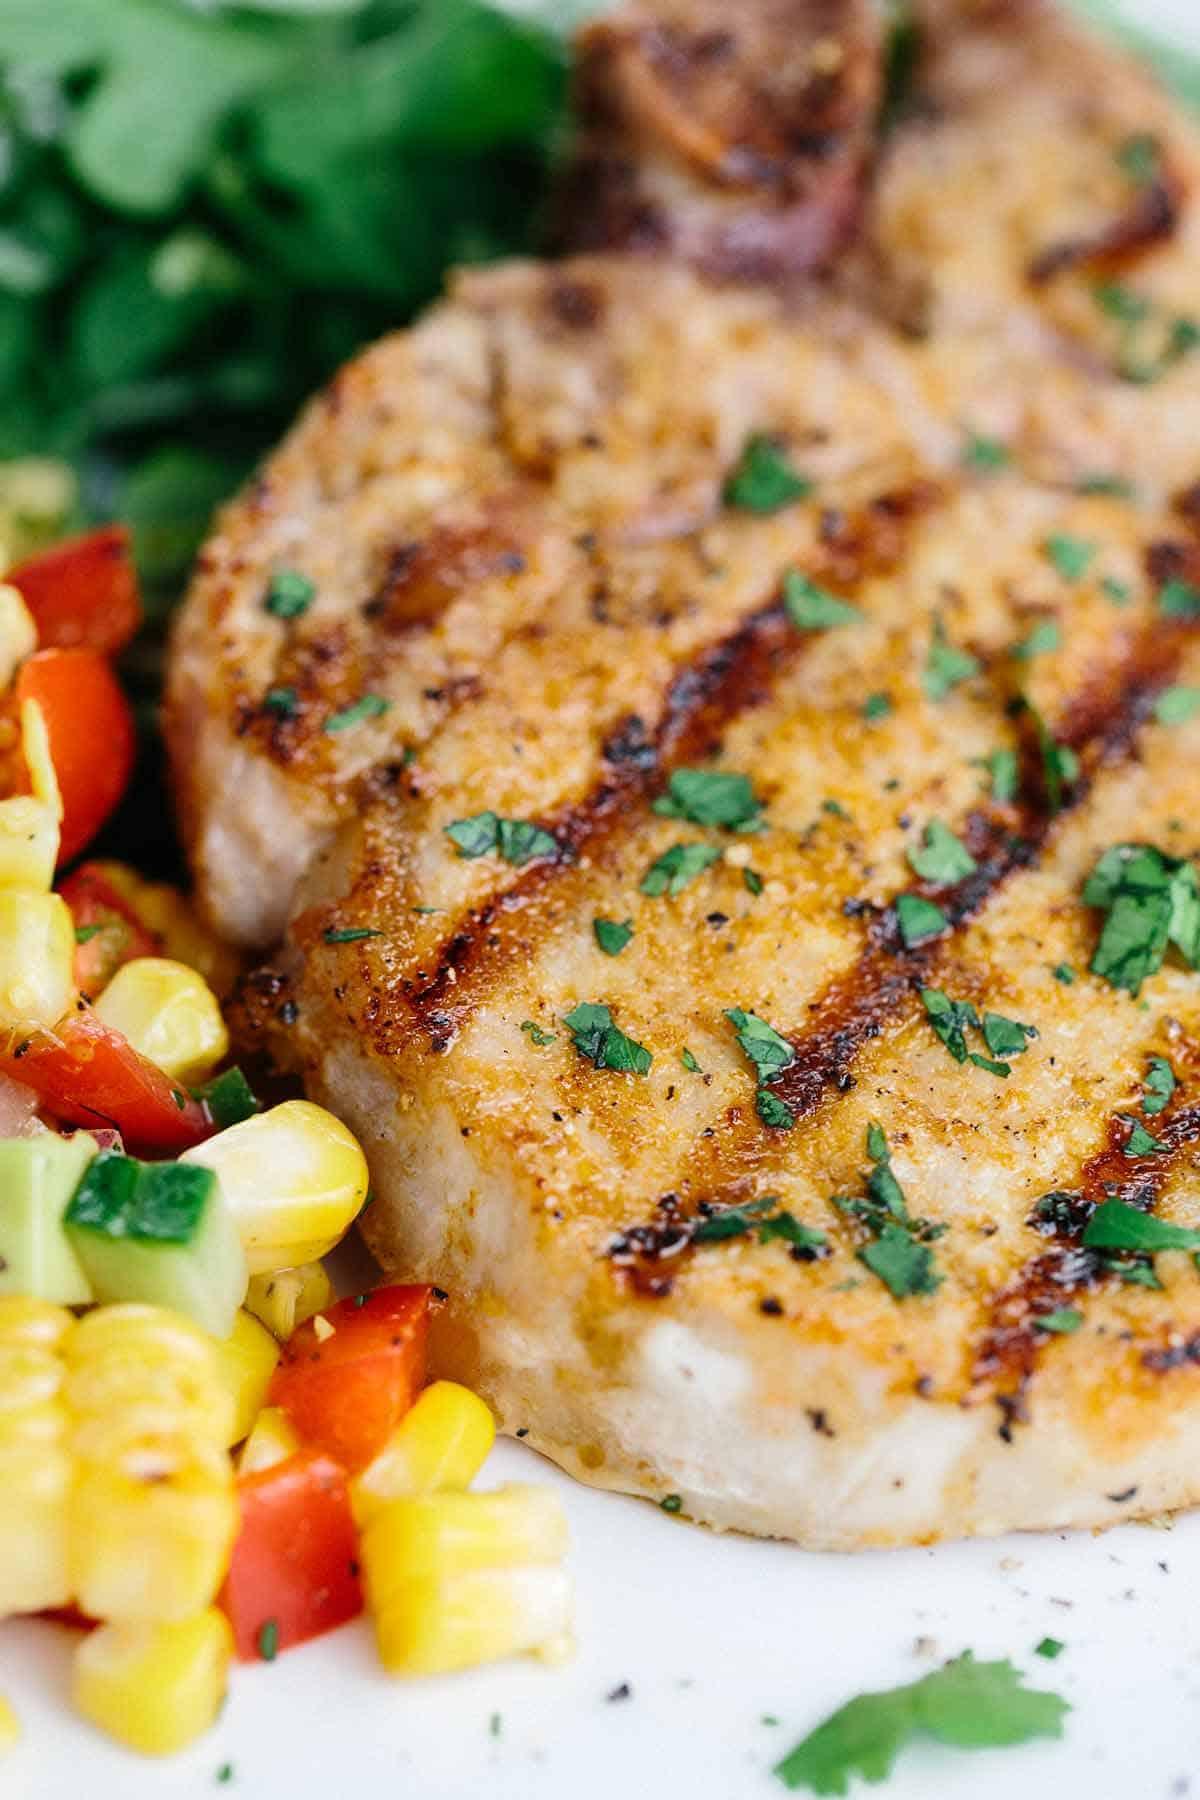 Spiced Pork Chops with Corn Salad